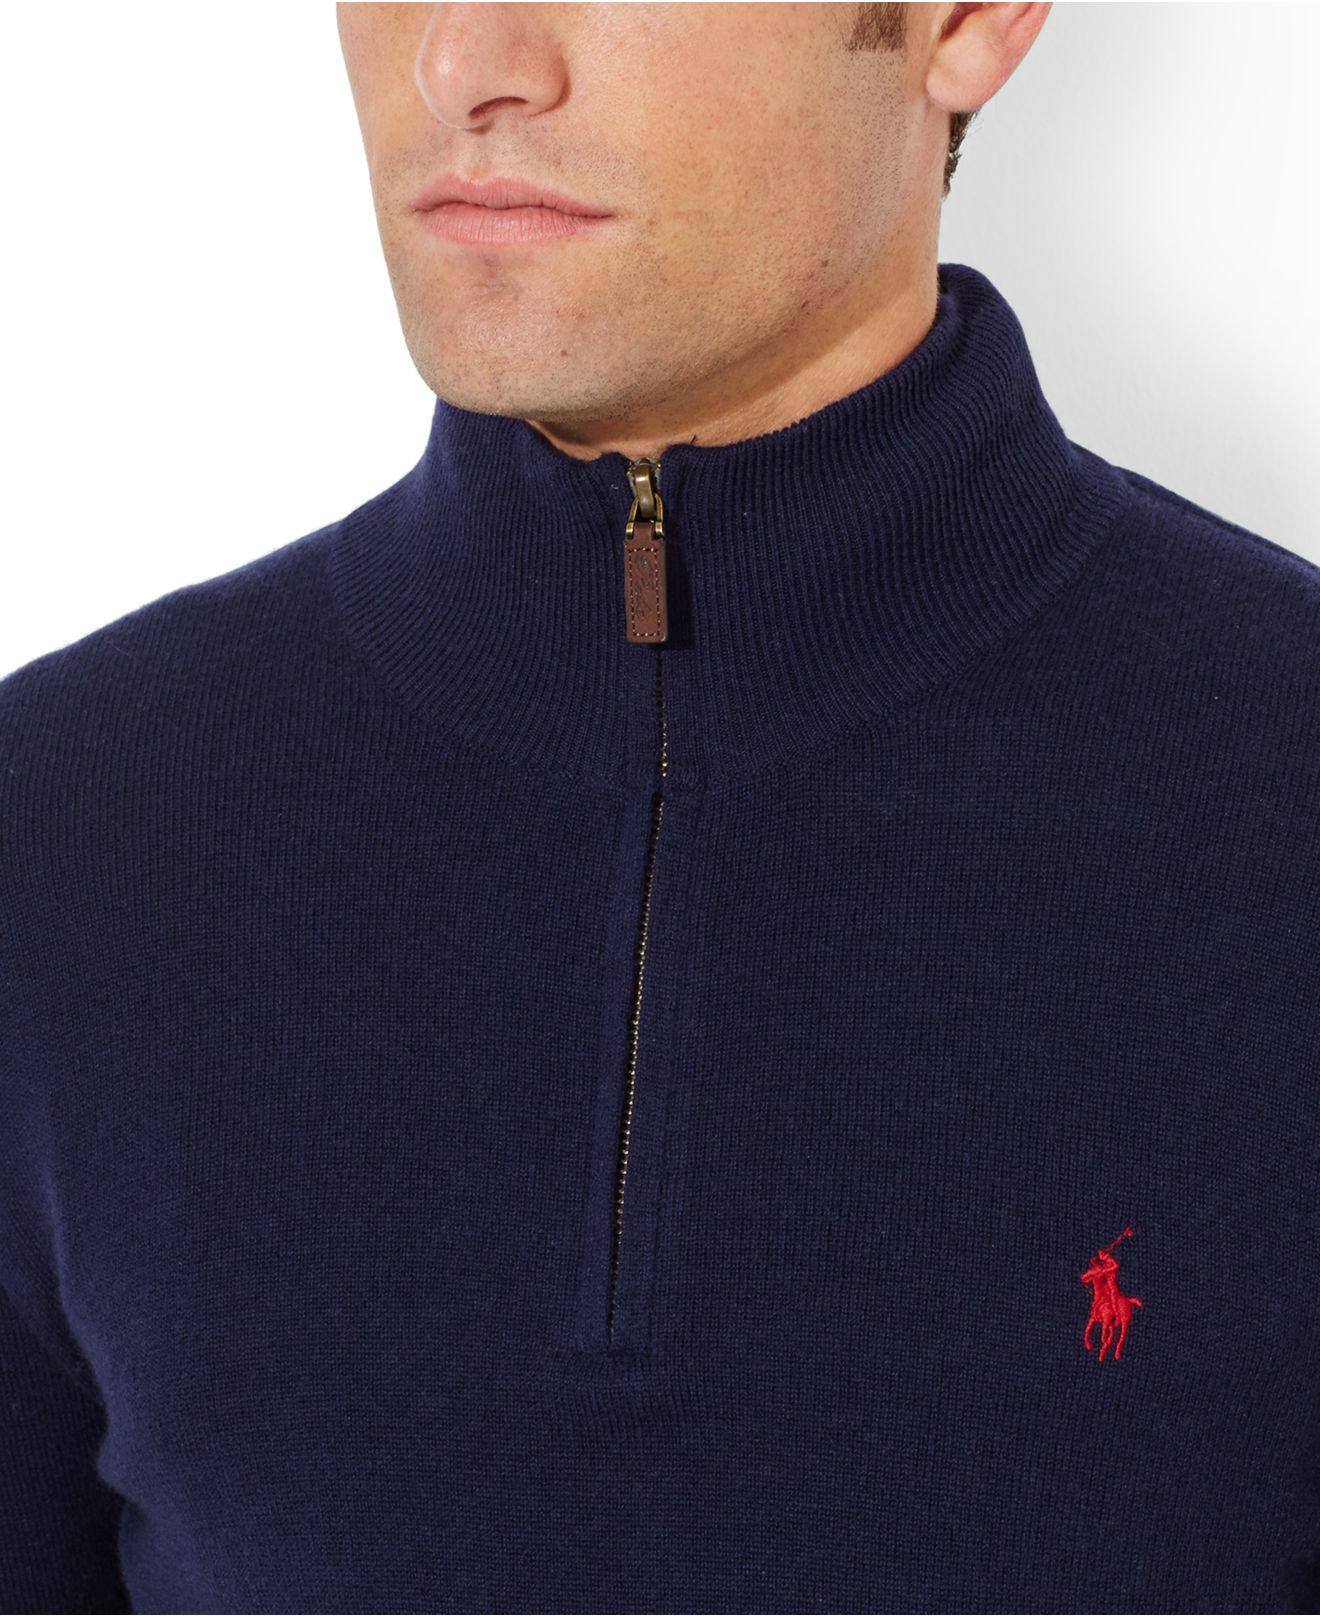 a09256126 Polo Ralph Lauren Merino Wool Half-Zip Sweater in Blue for Men - Lyst